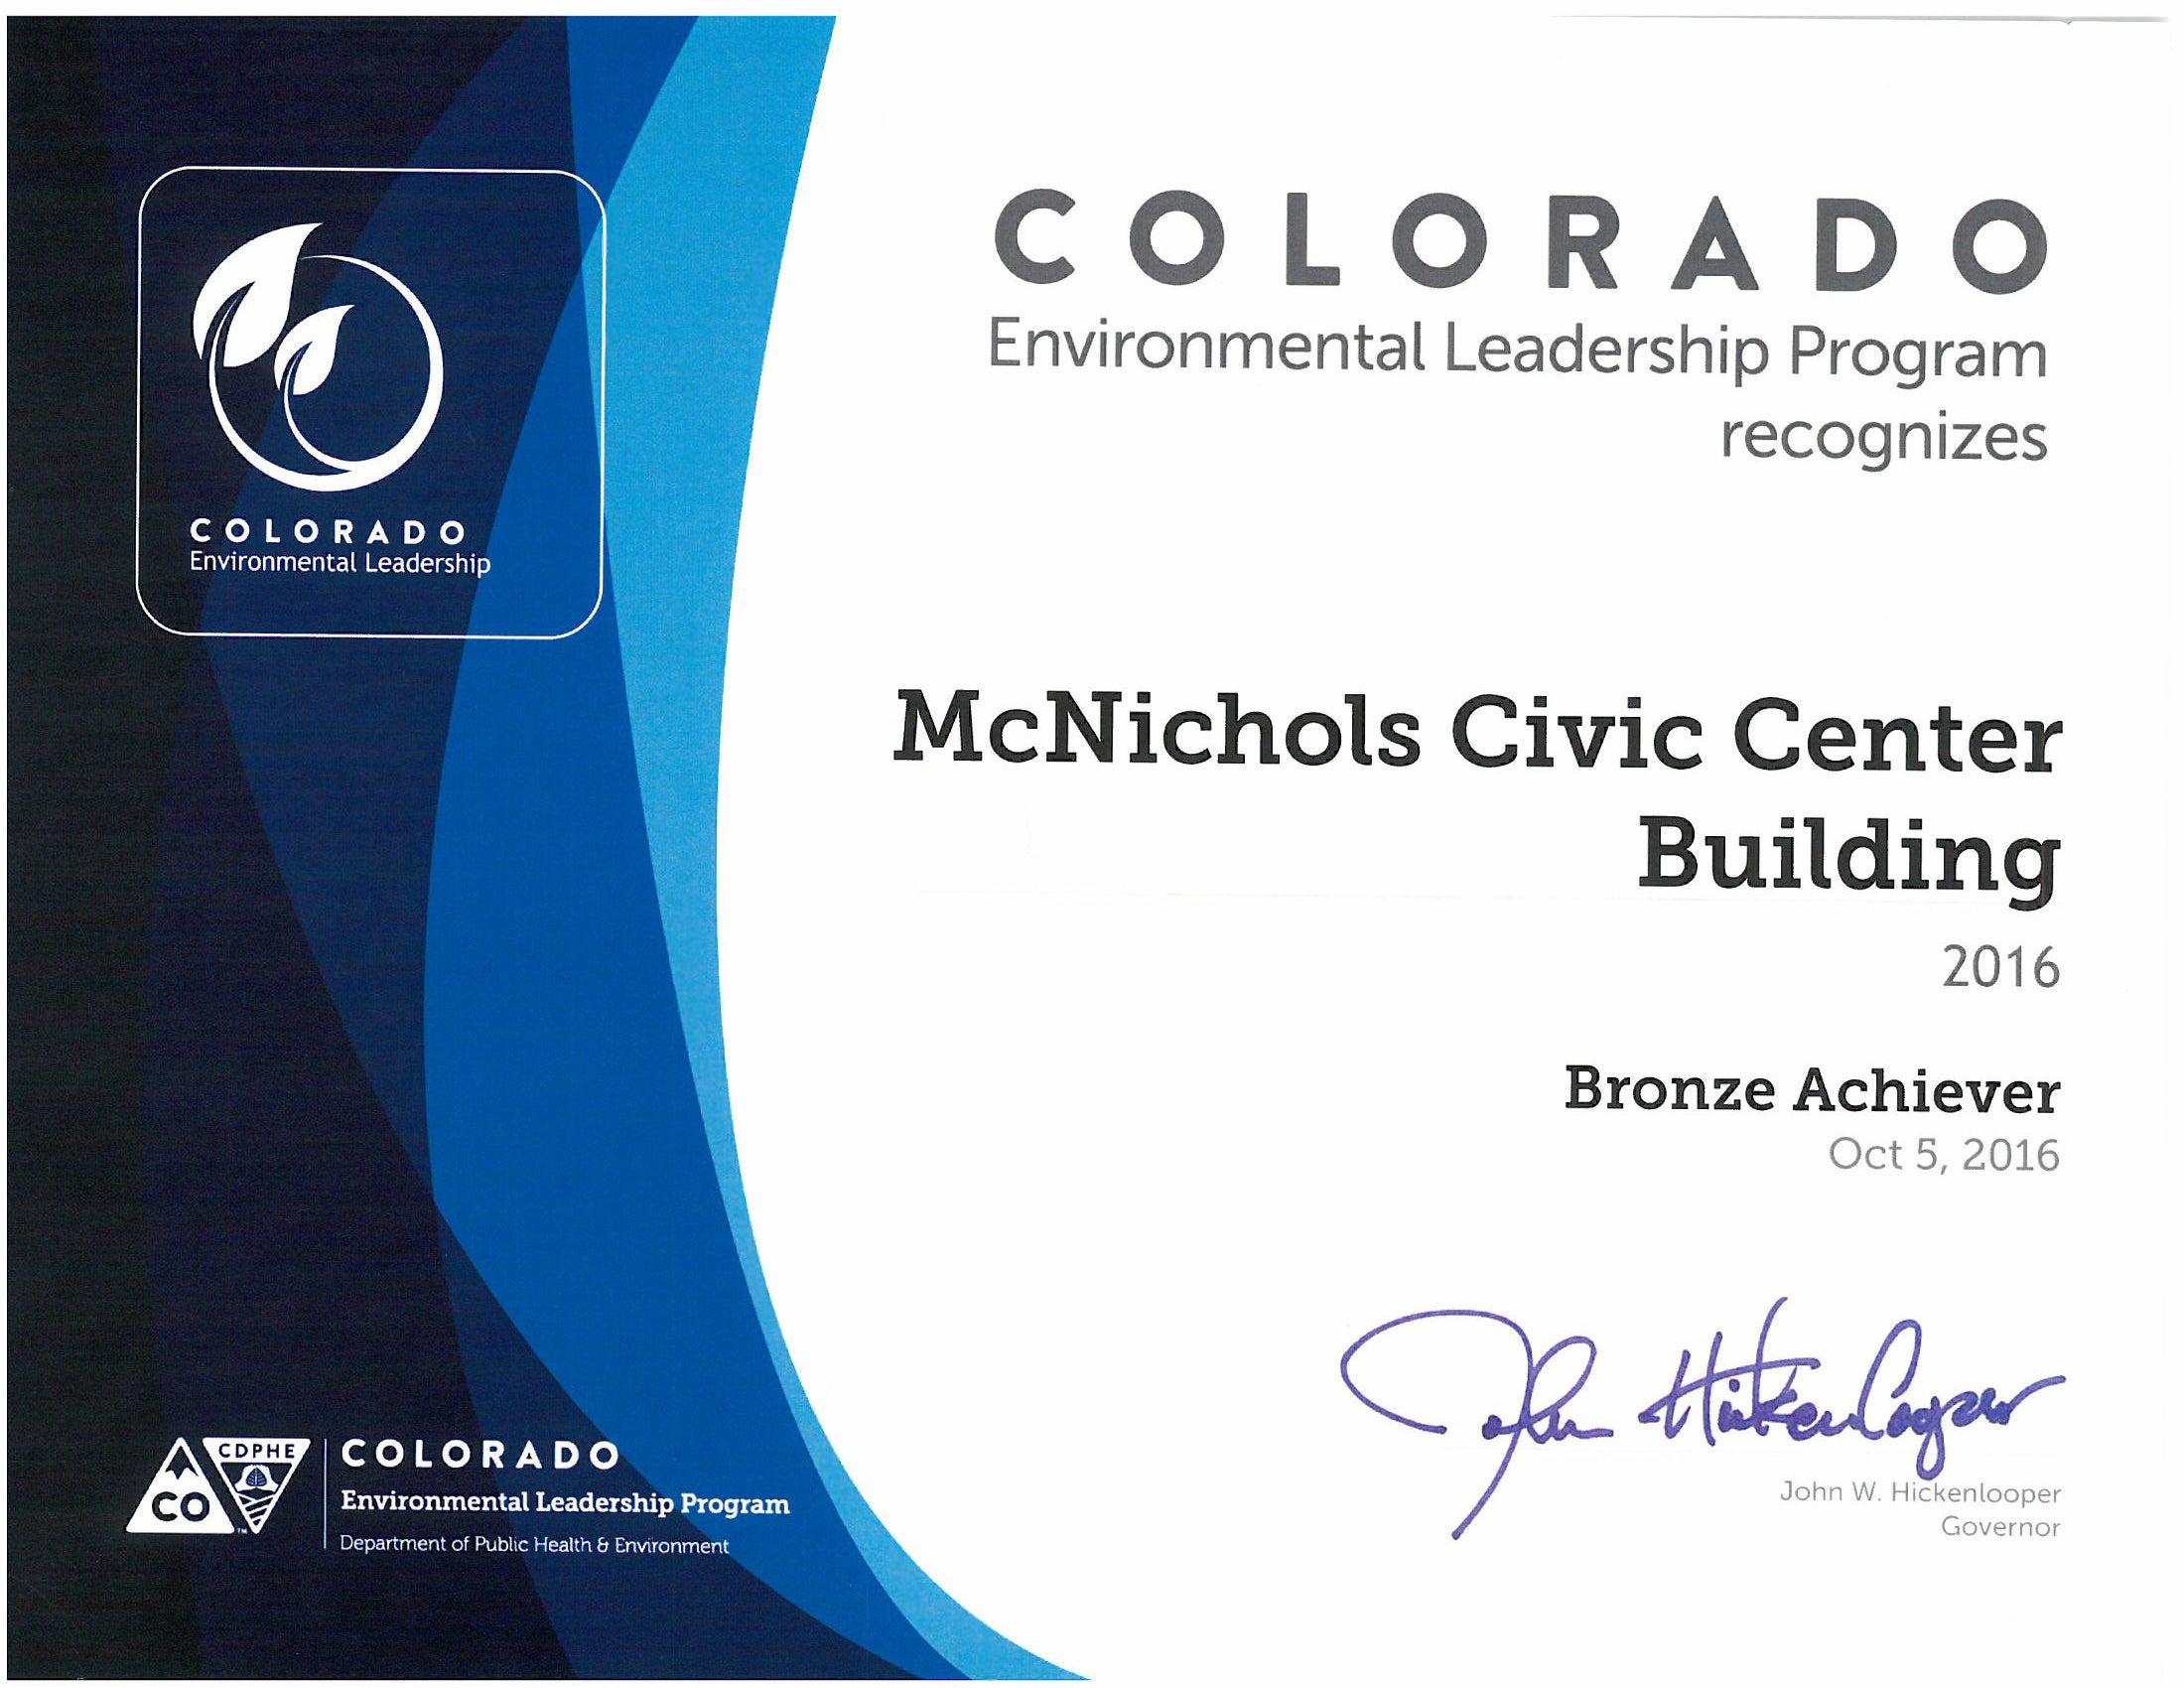 CO_Environmental_Leadership_Award_McNichols.jpg